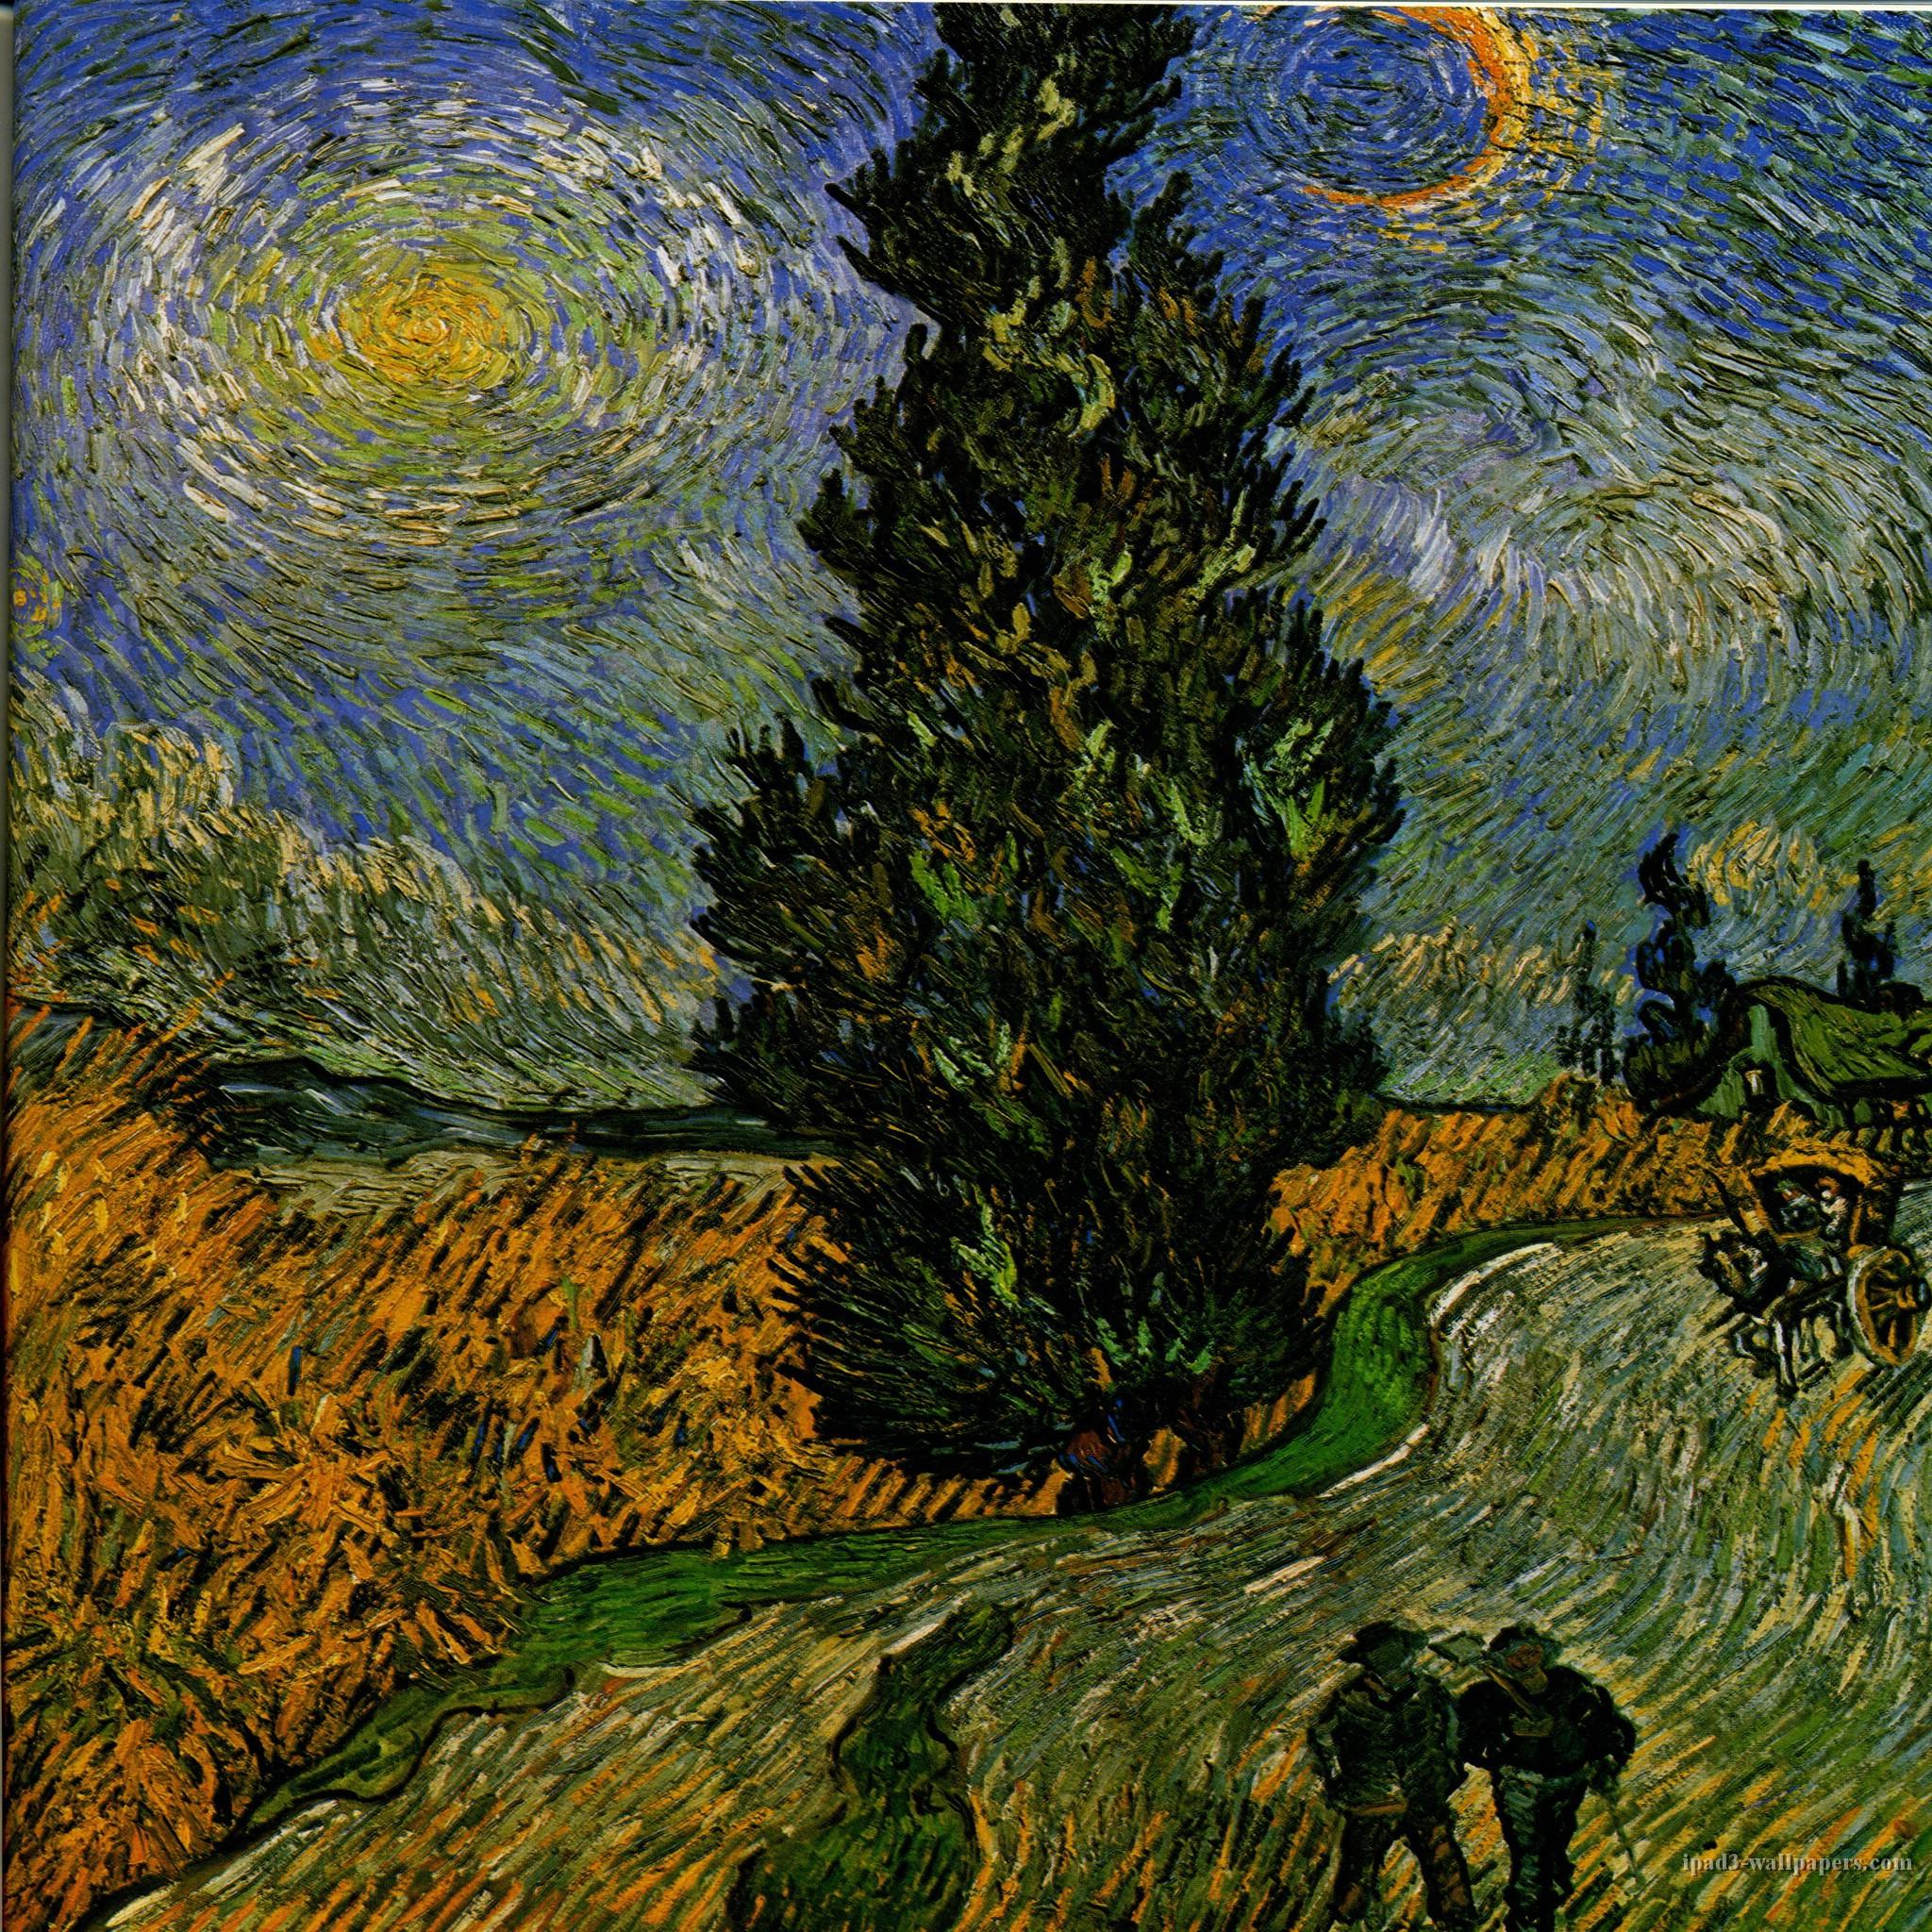 Van Gogh Wallpaper: Van Gogh Wallpaper Widescreen